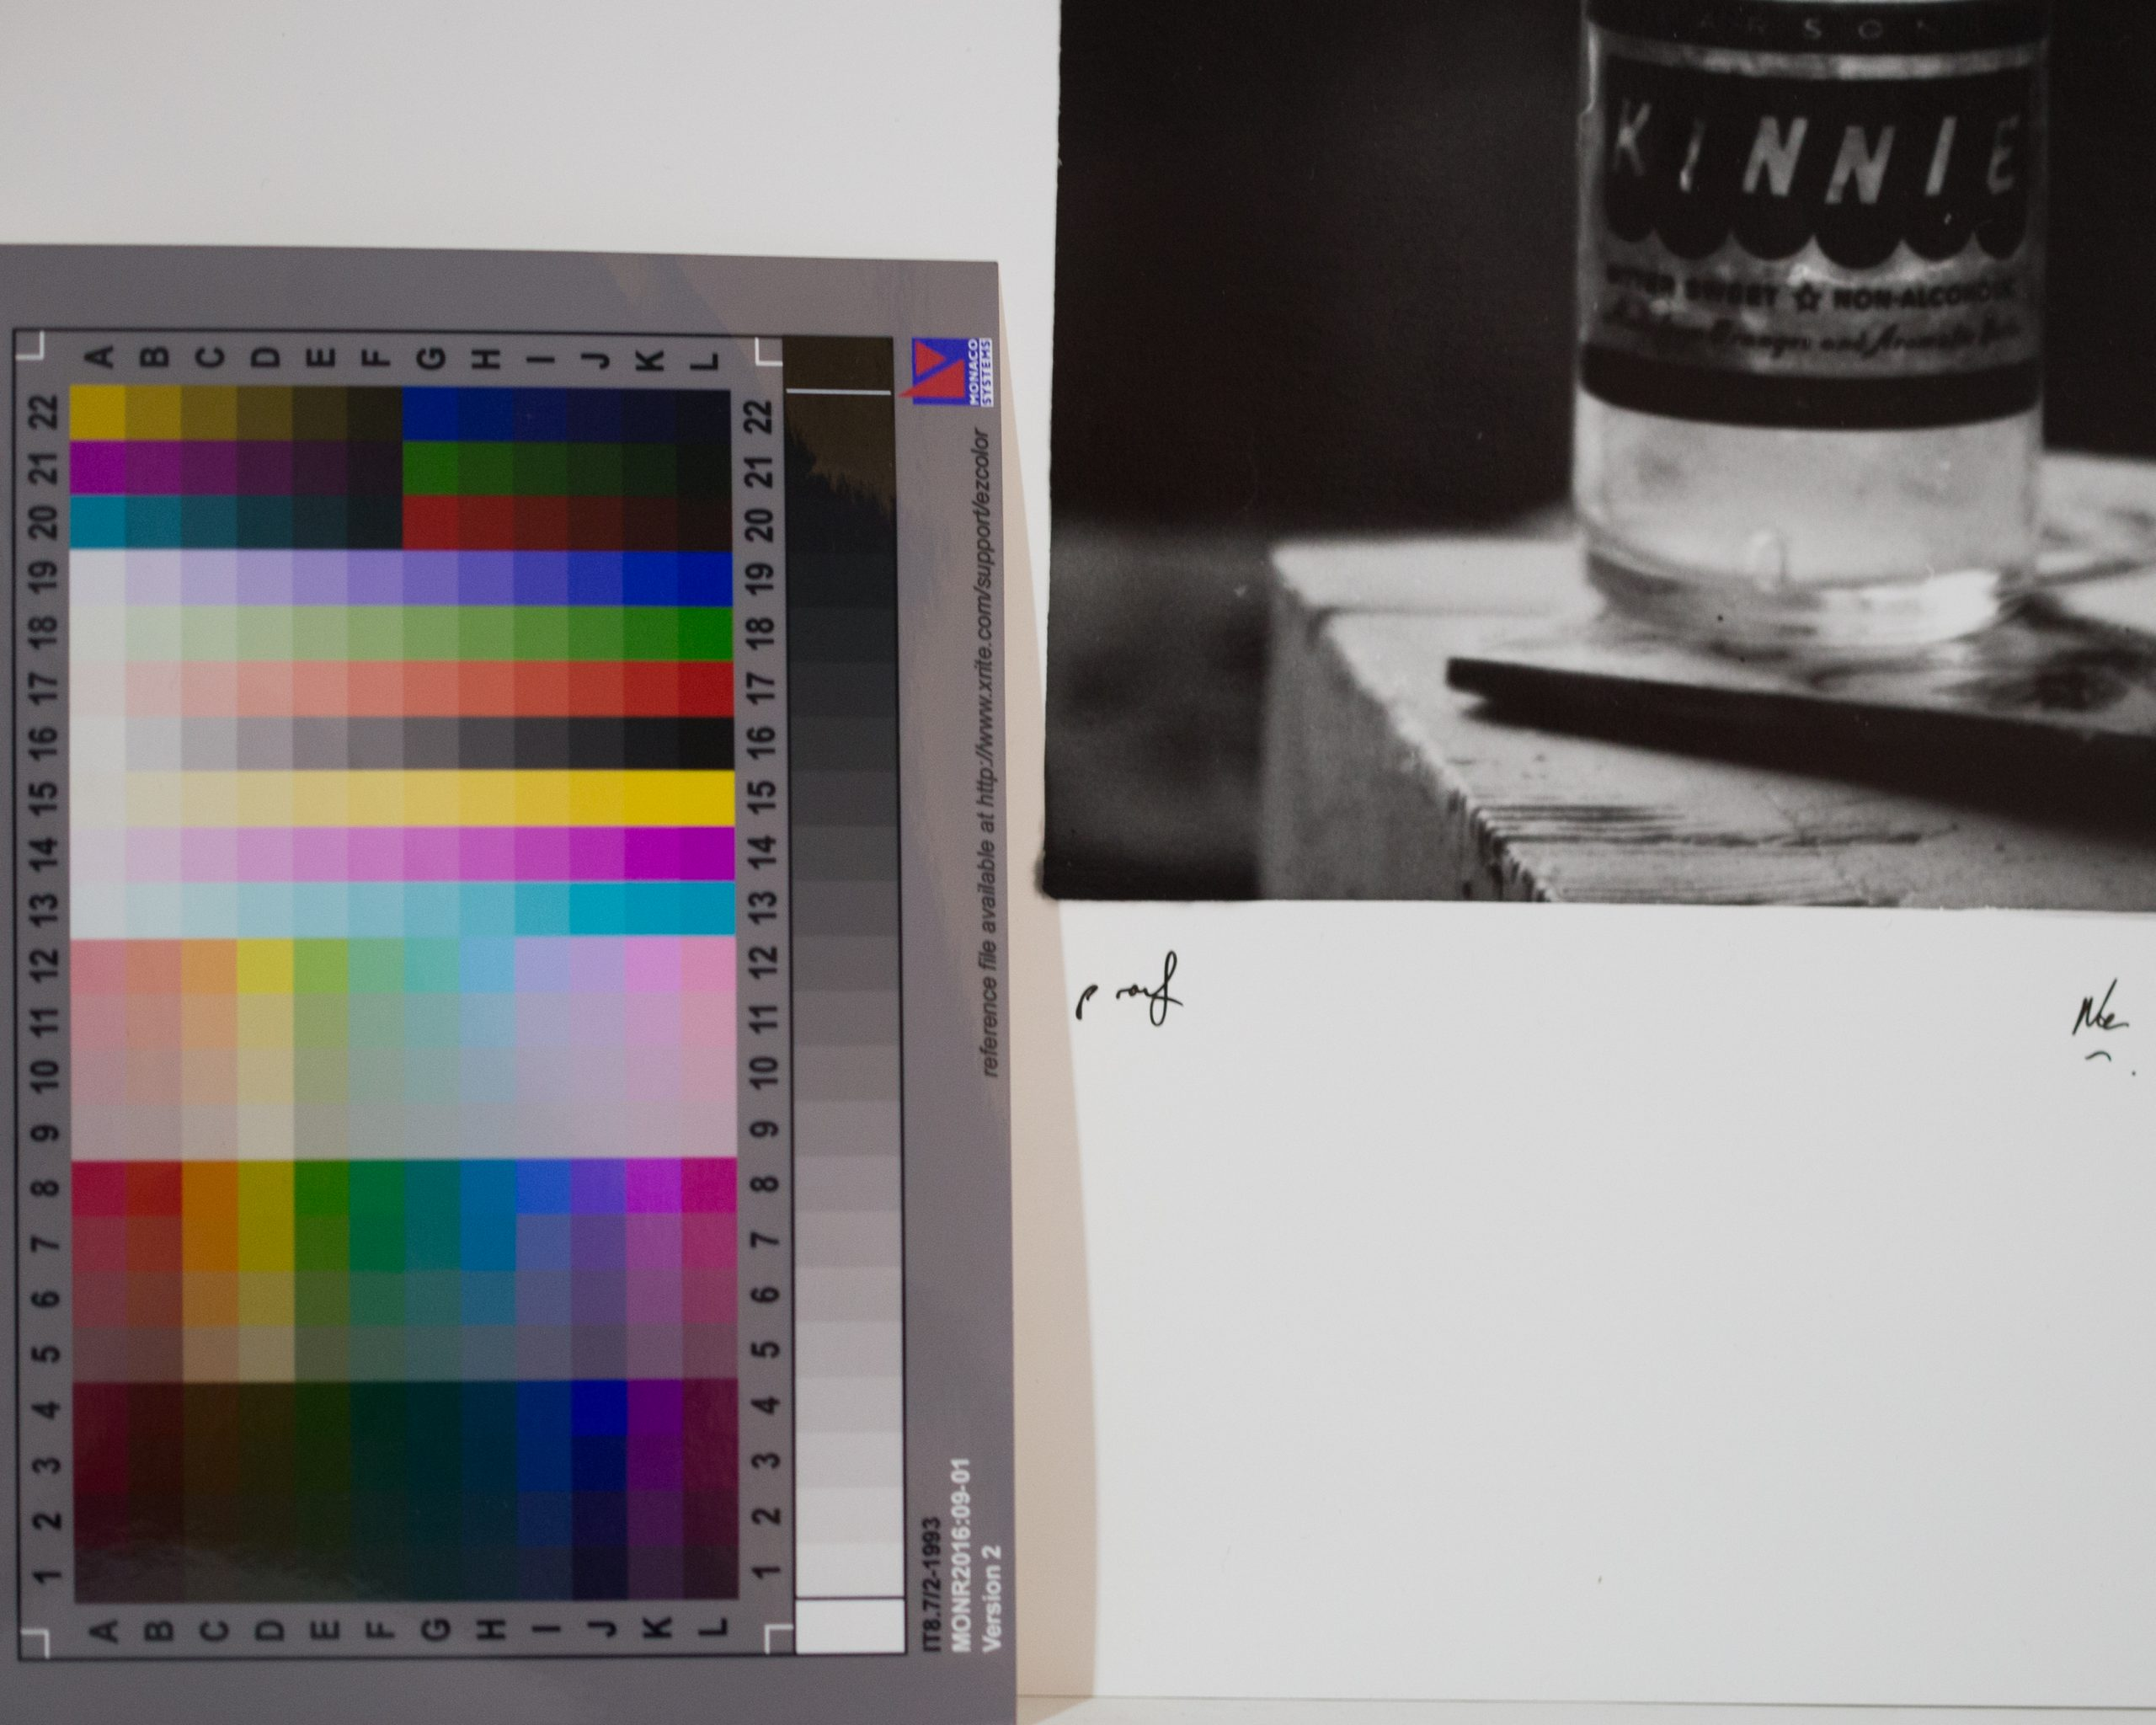 Alan Falzon, Fotographija, Hand Printed Exhibition, Silver Gelatin, Darkroom, Fine Art, Traditional, Hand Made, Unique Prints, Photography, Kinnie, Maltese Soft Drink, Valletta